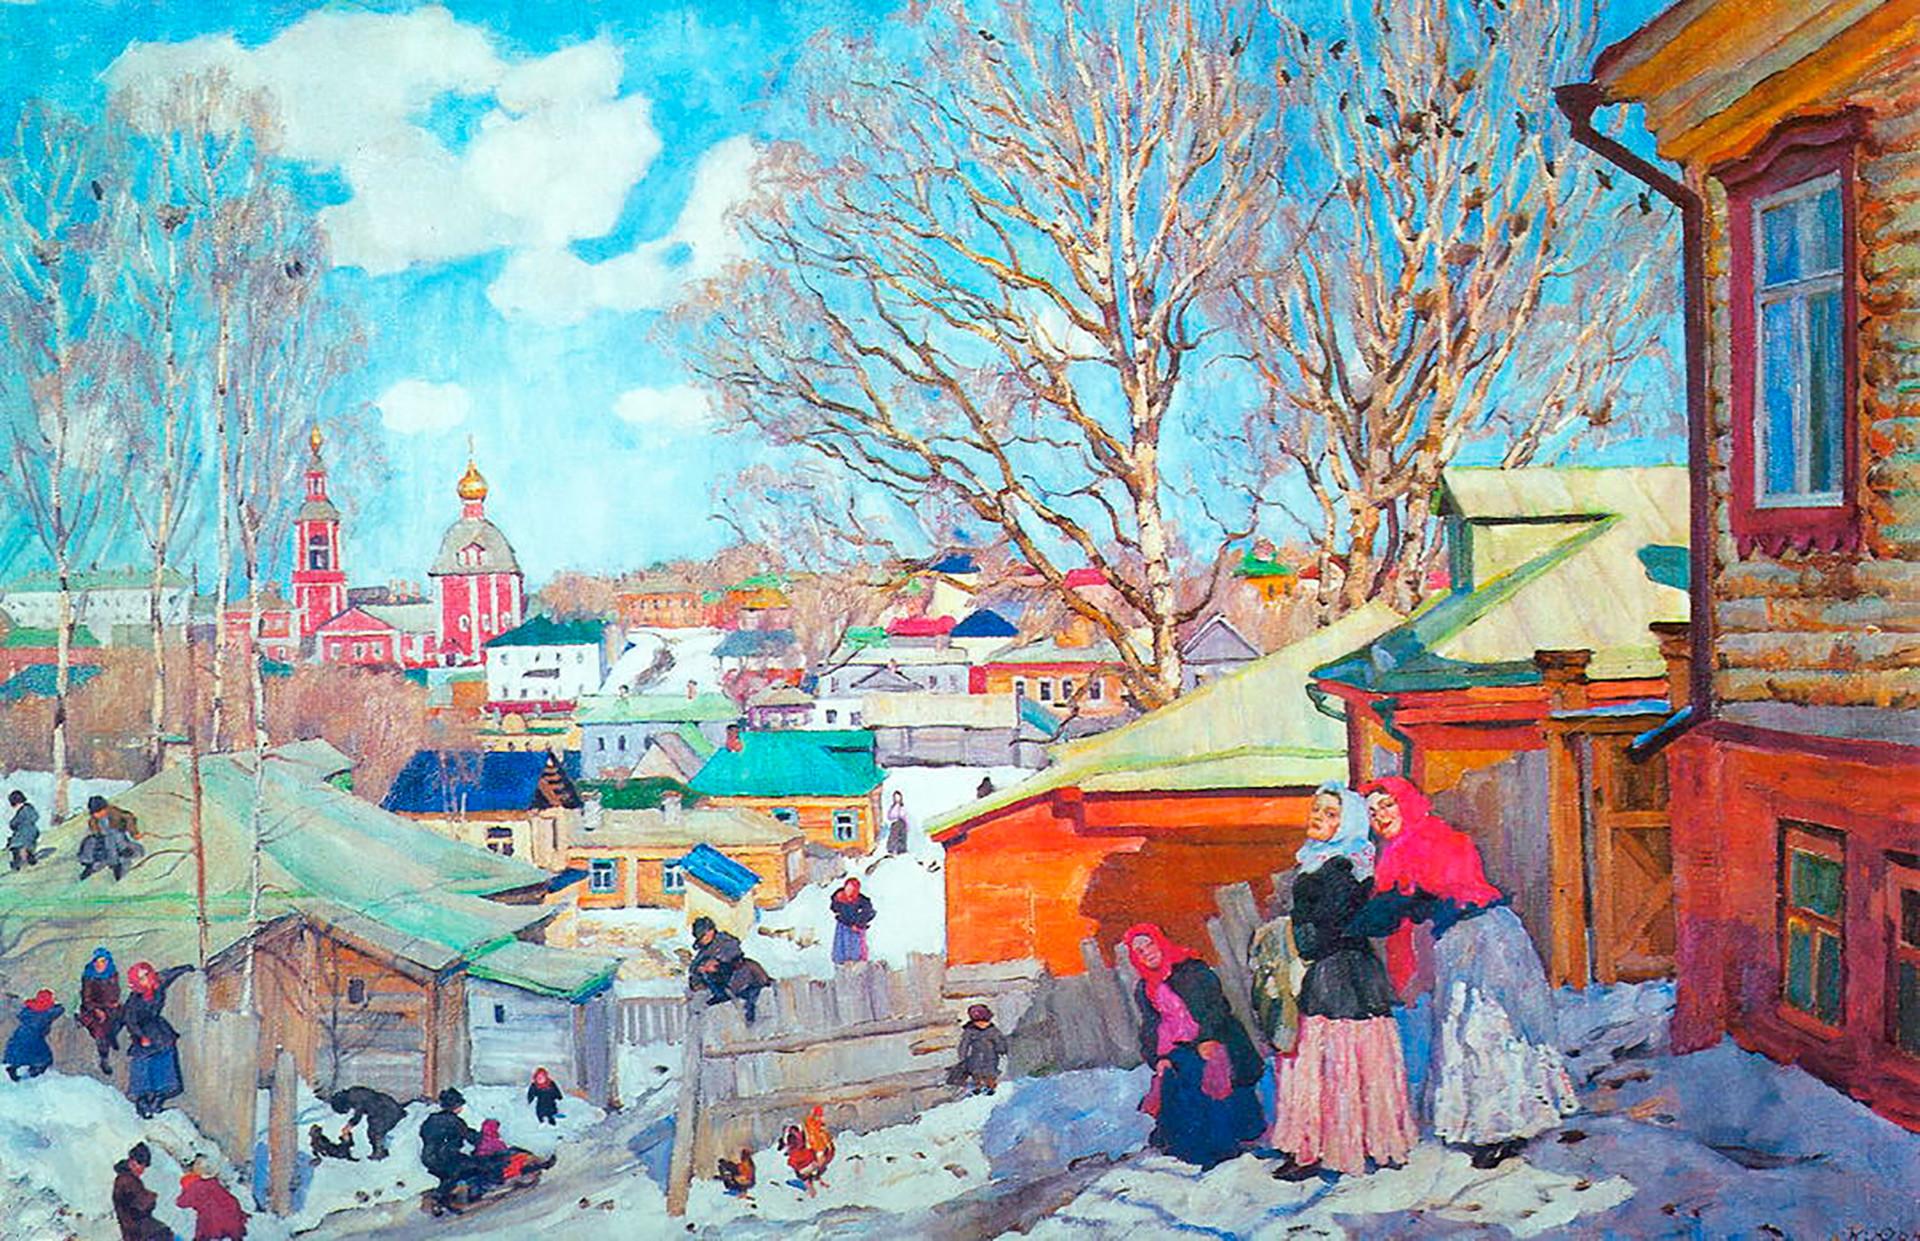 Sončen spomladanski dan, 1910, Konstantin Juon